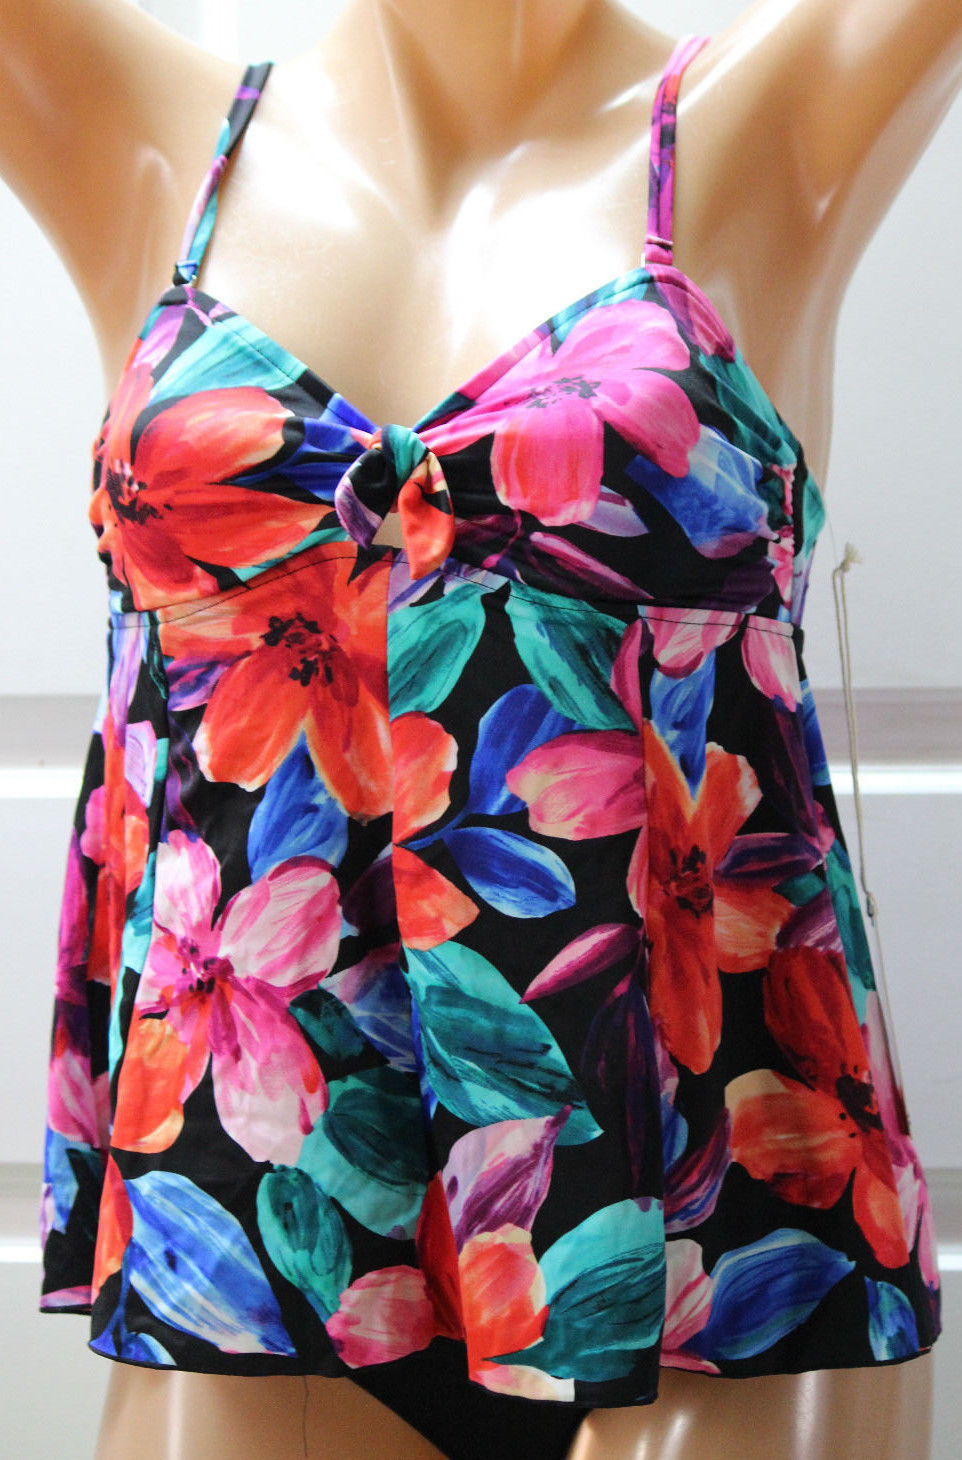 NWT Caribbean Joe Floral Swim Tankini Top Multi-Color (Missing Straps) Size 10 - $9.35